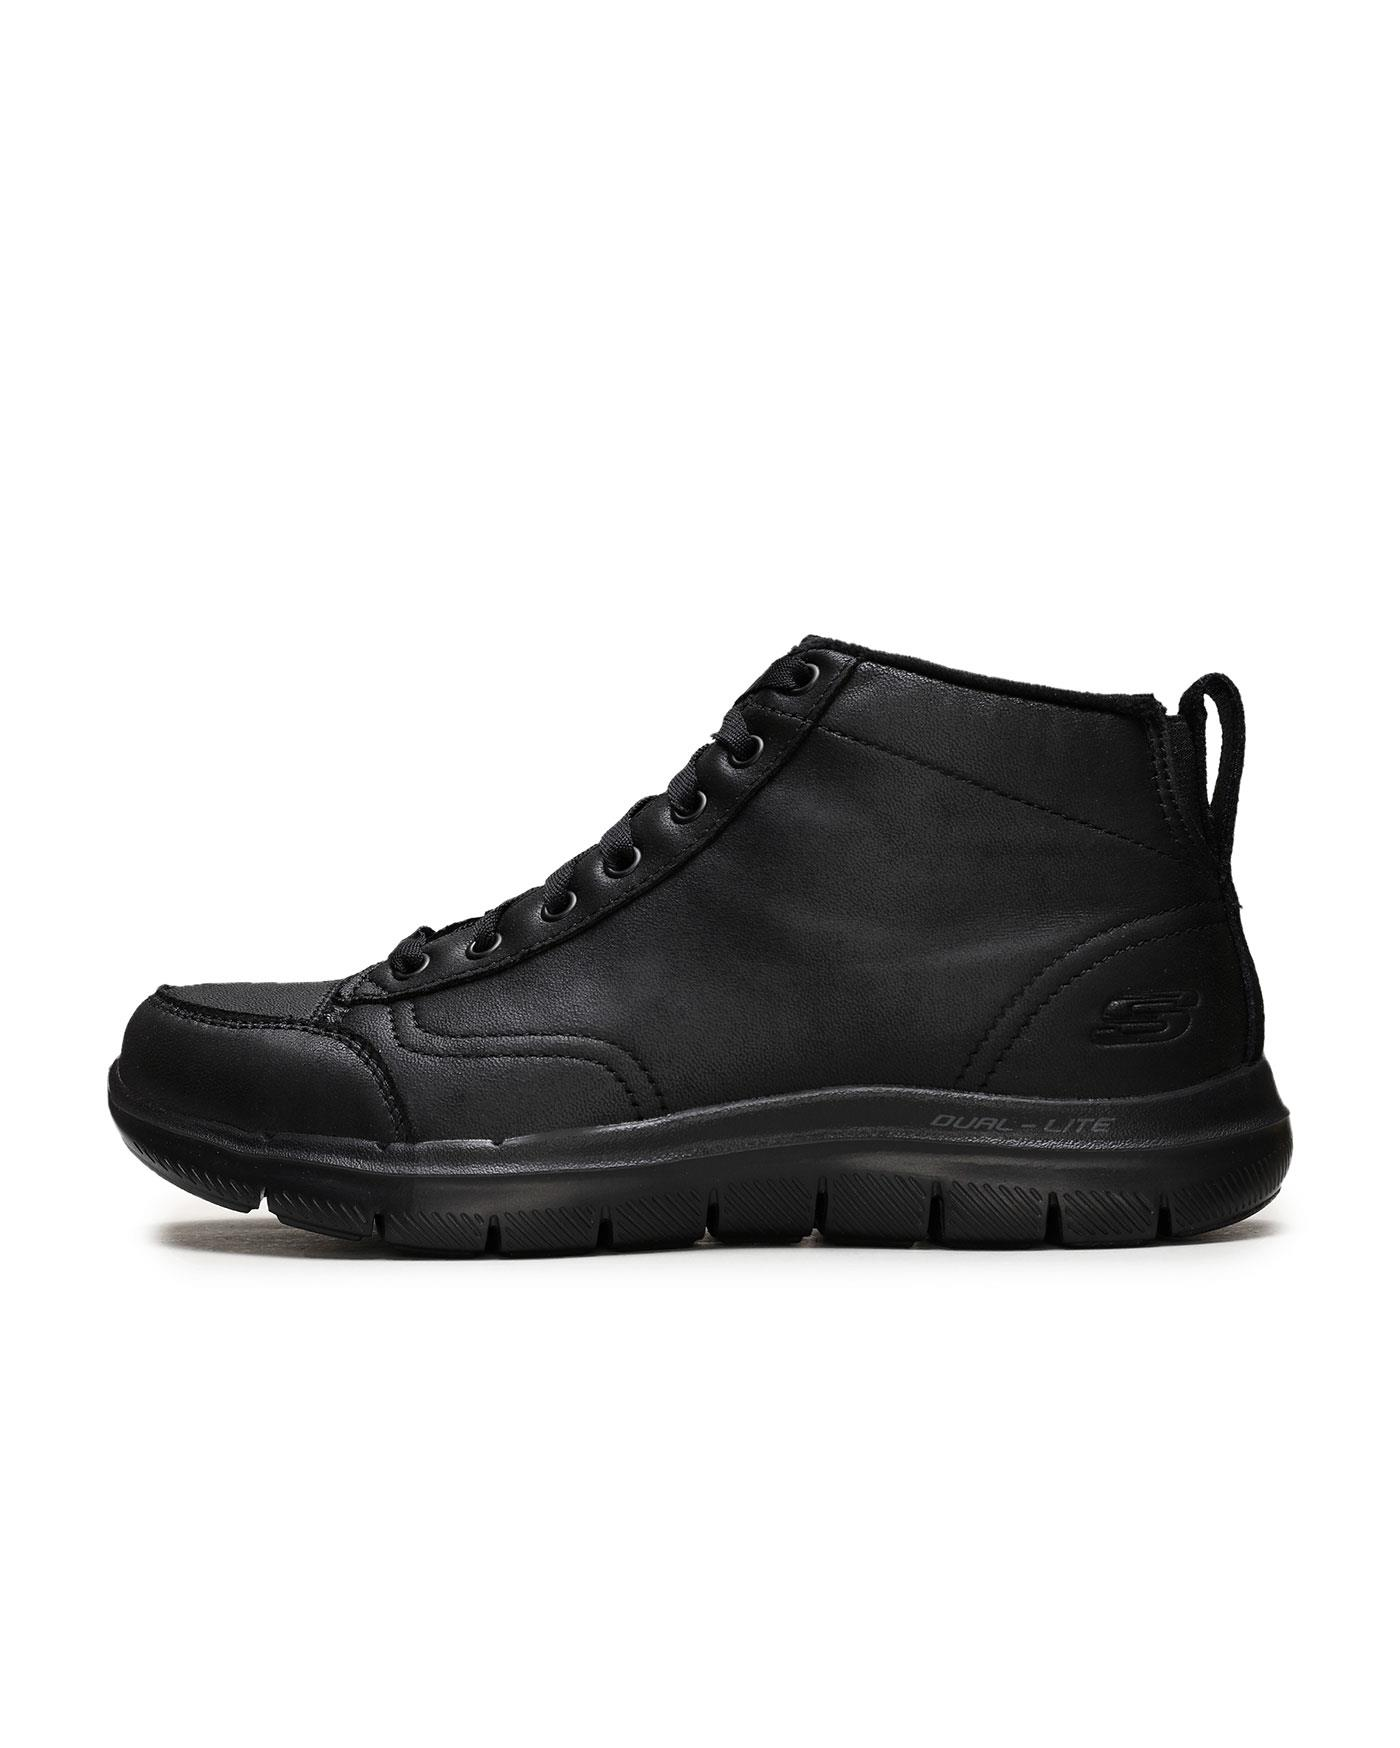 Skechers Flex Appeal 2.0- Warm Wıshes Bayan Ayakkabısı SKC12892 BBK